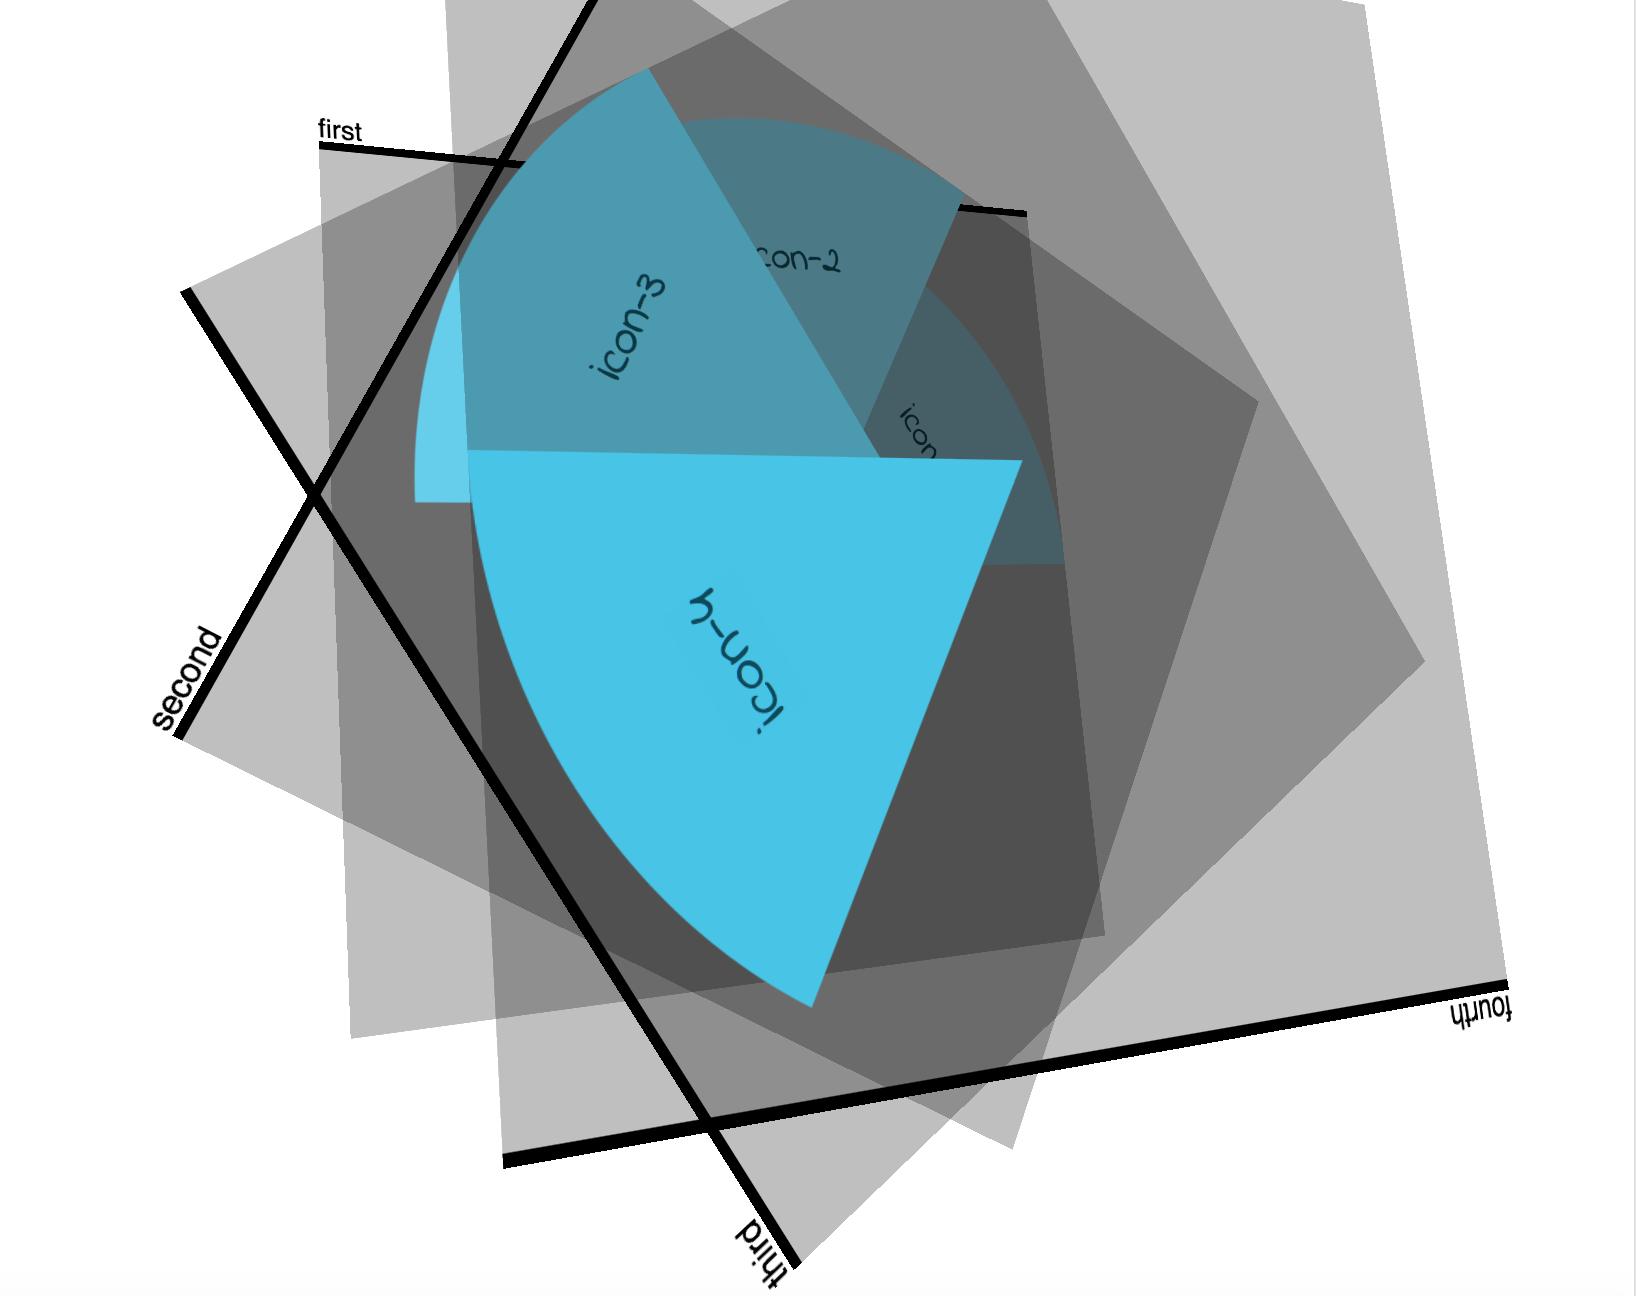 Building A Circular Navigation with CSS Clip Paths | CSS-Tricks